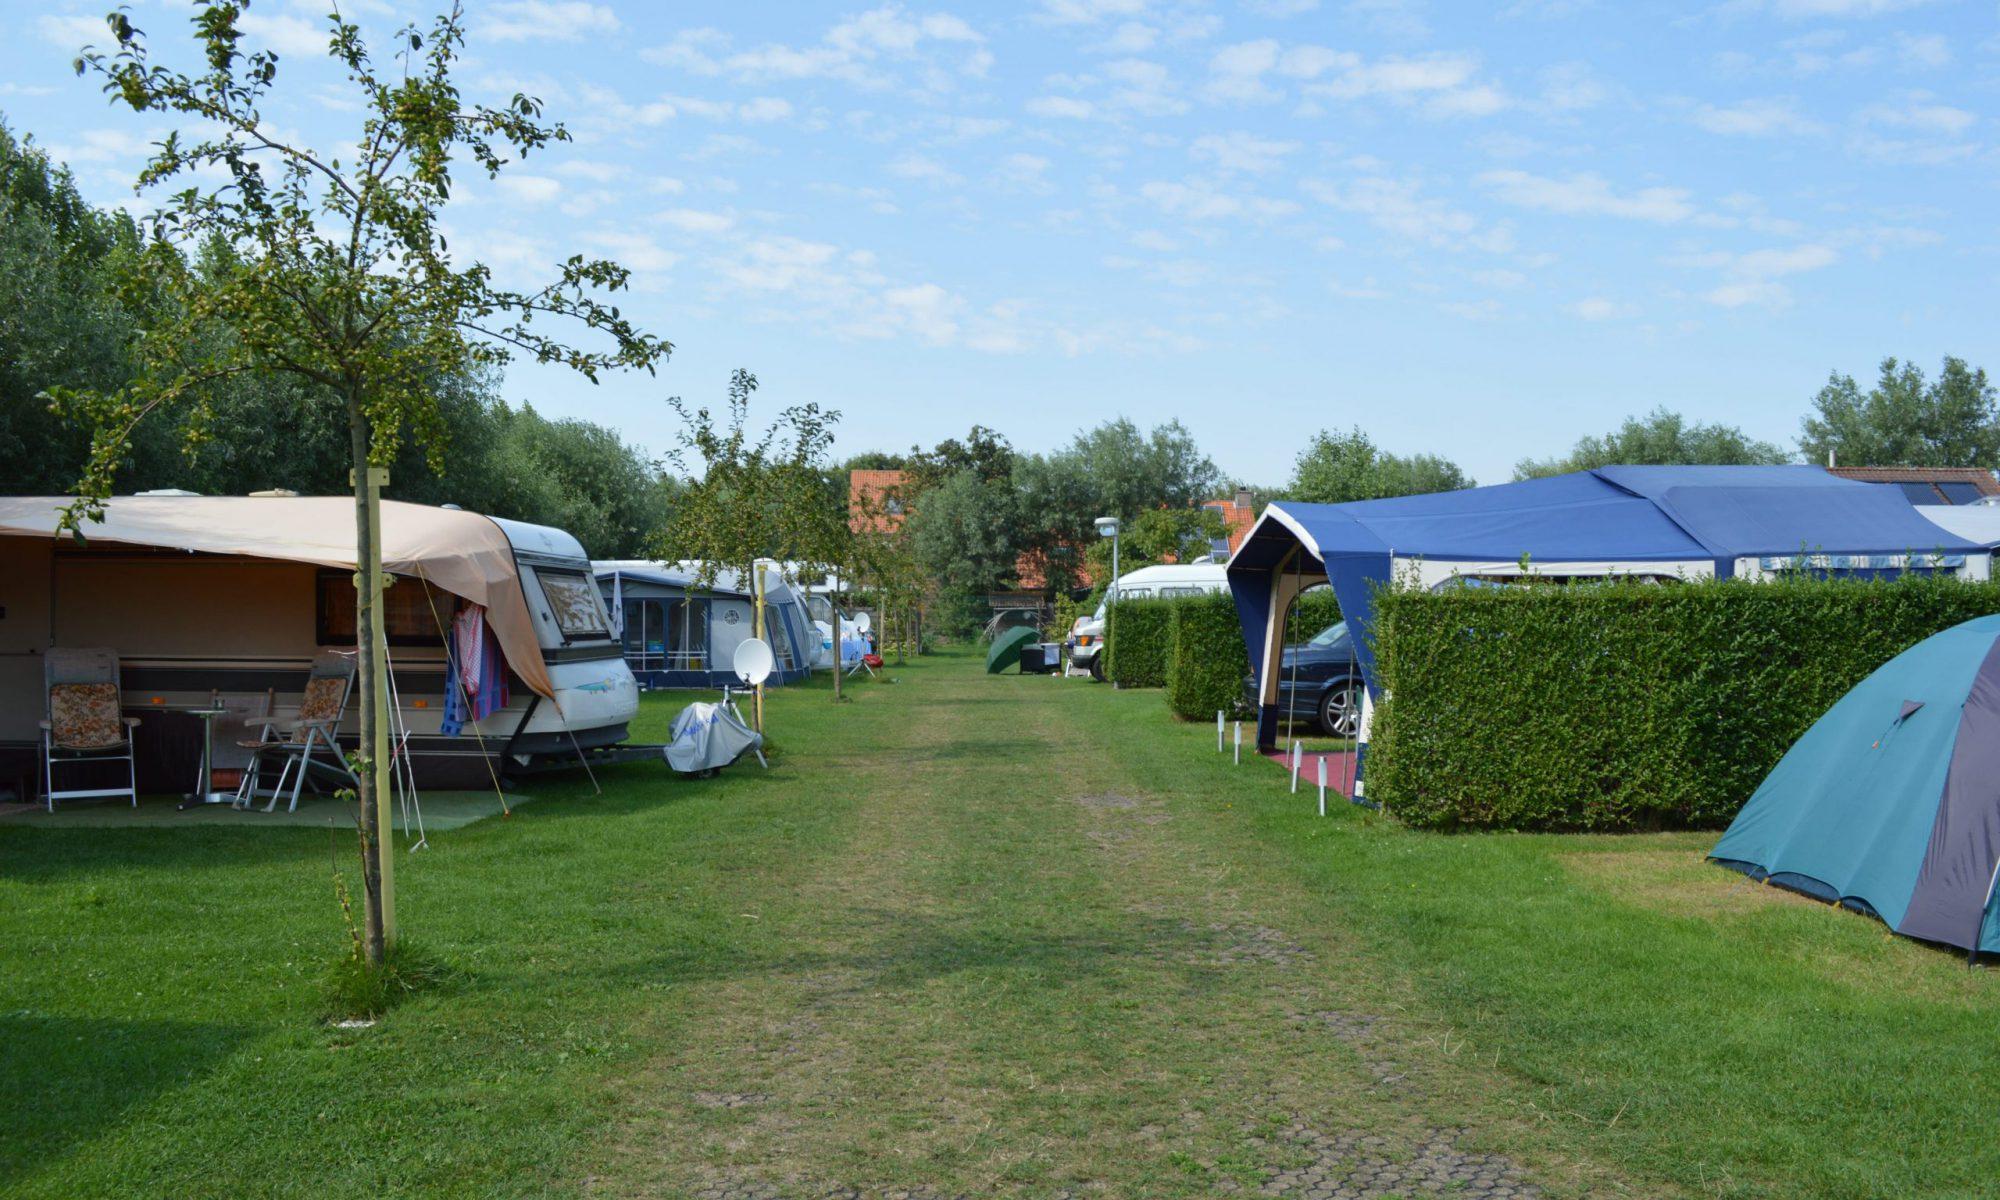 Camping De Heide